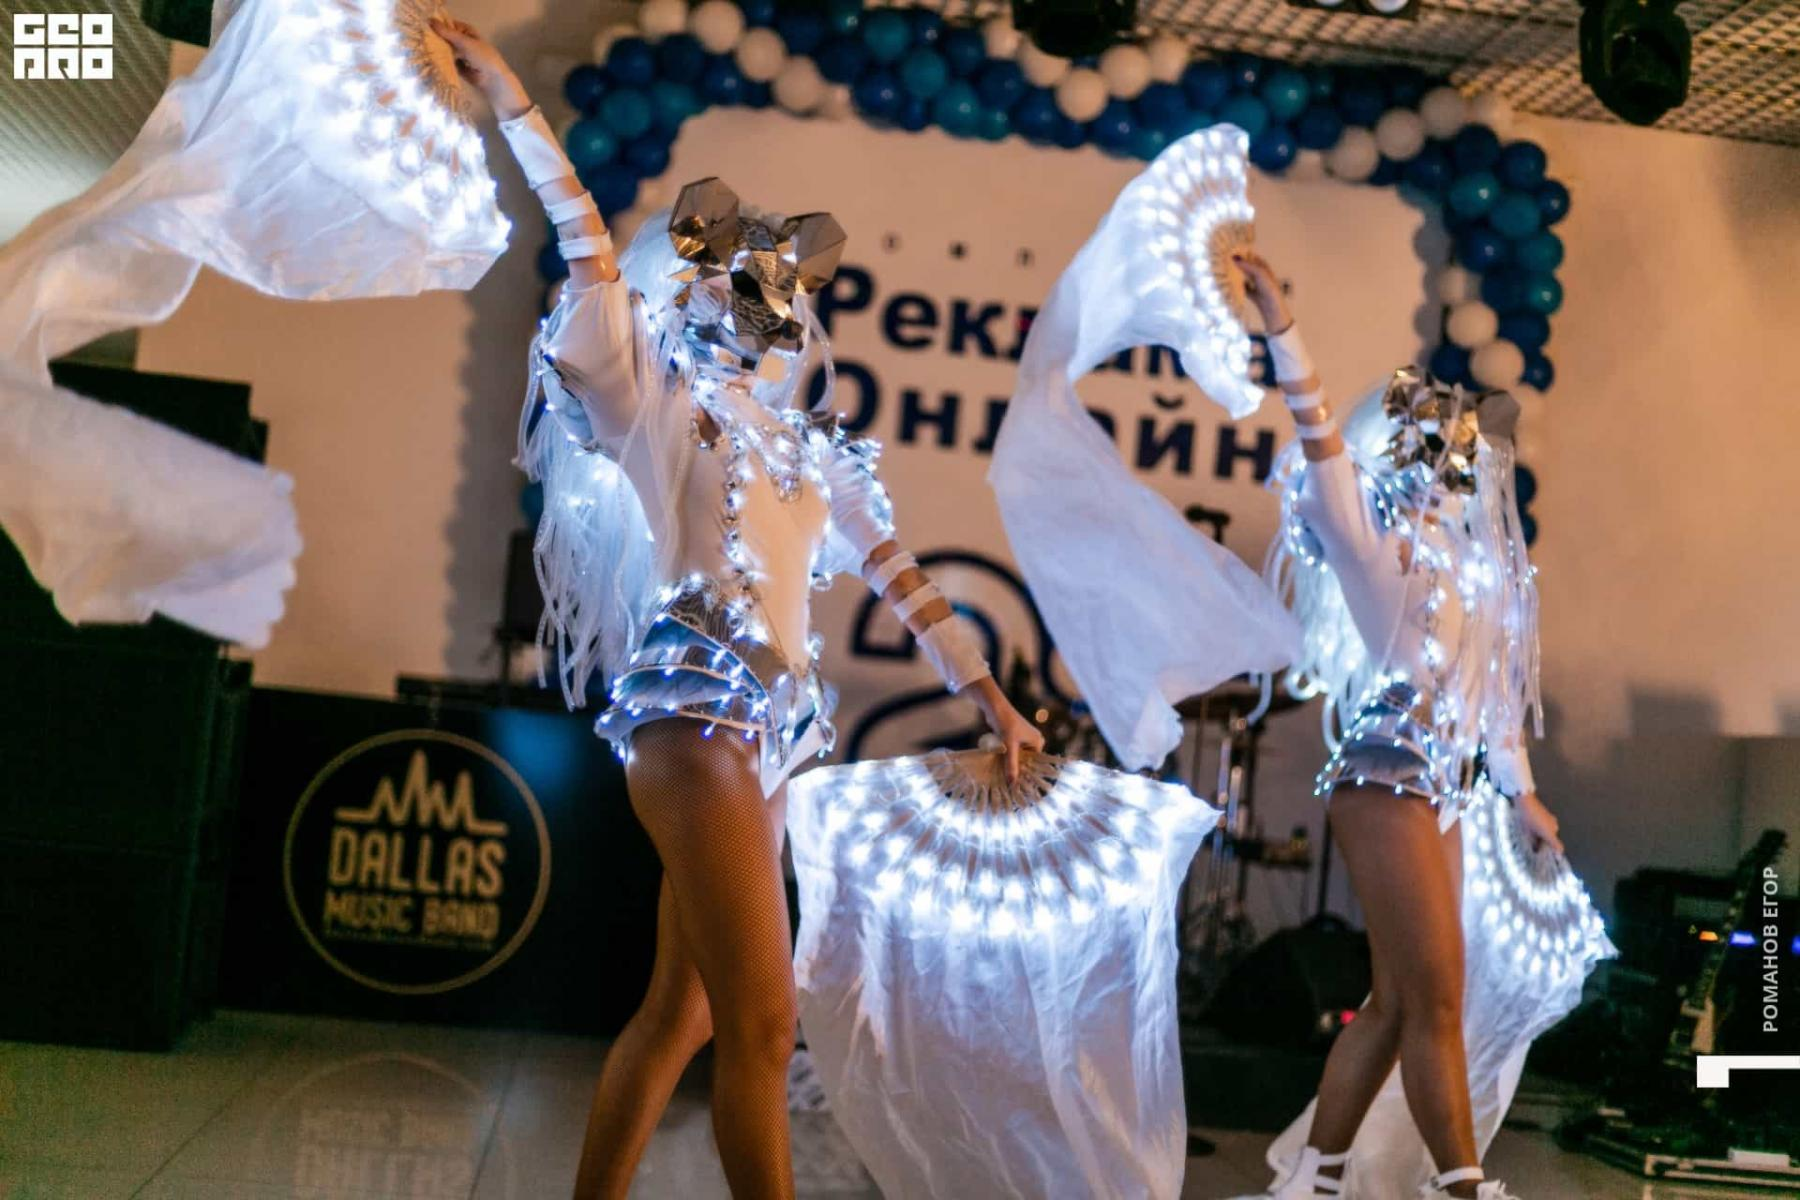 Фото Юбилей с размахом: Митя Фомин два дня выступал на празднике ГК «Реклама Онлайн» 3